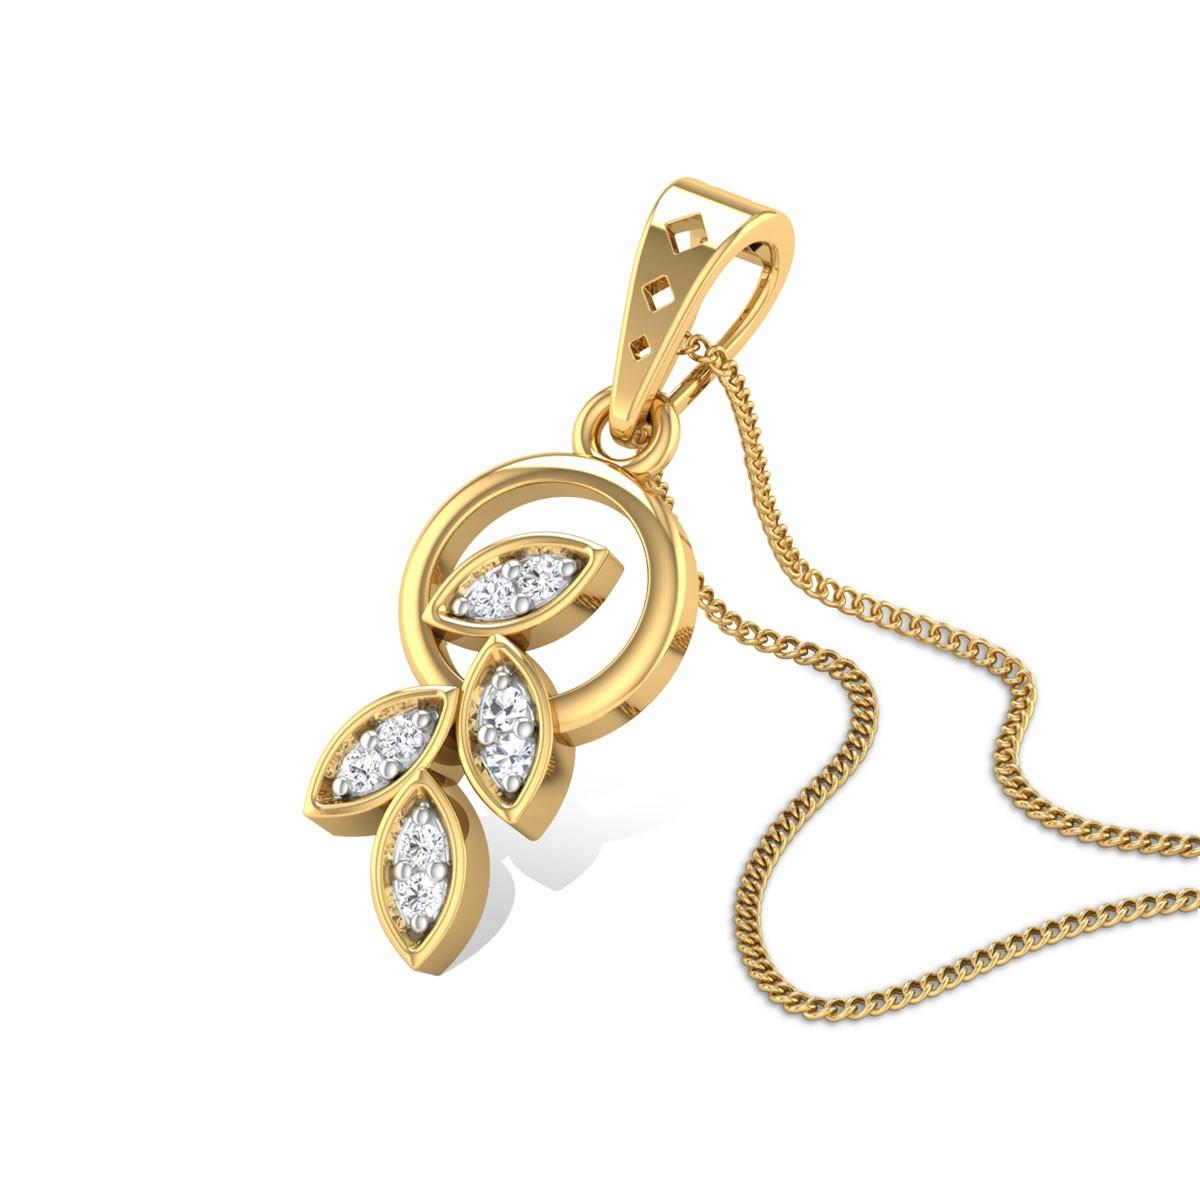 Centaura Diamond Pendant